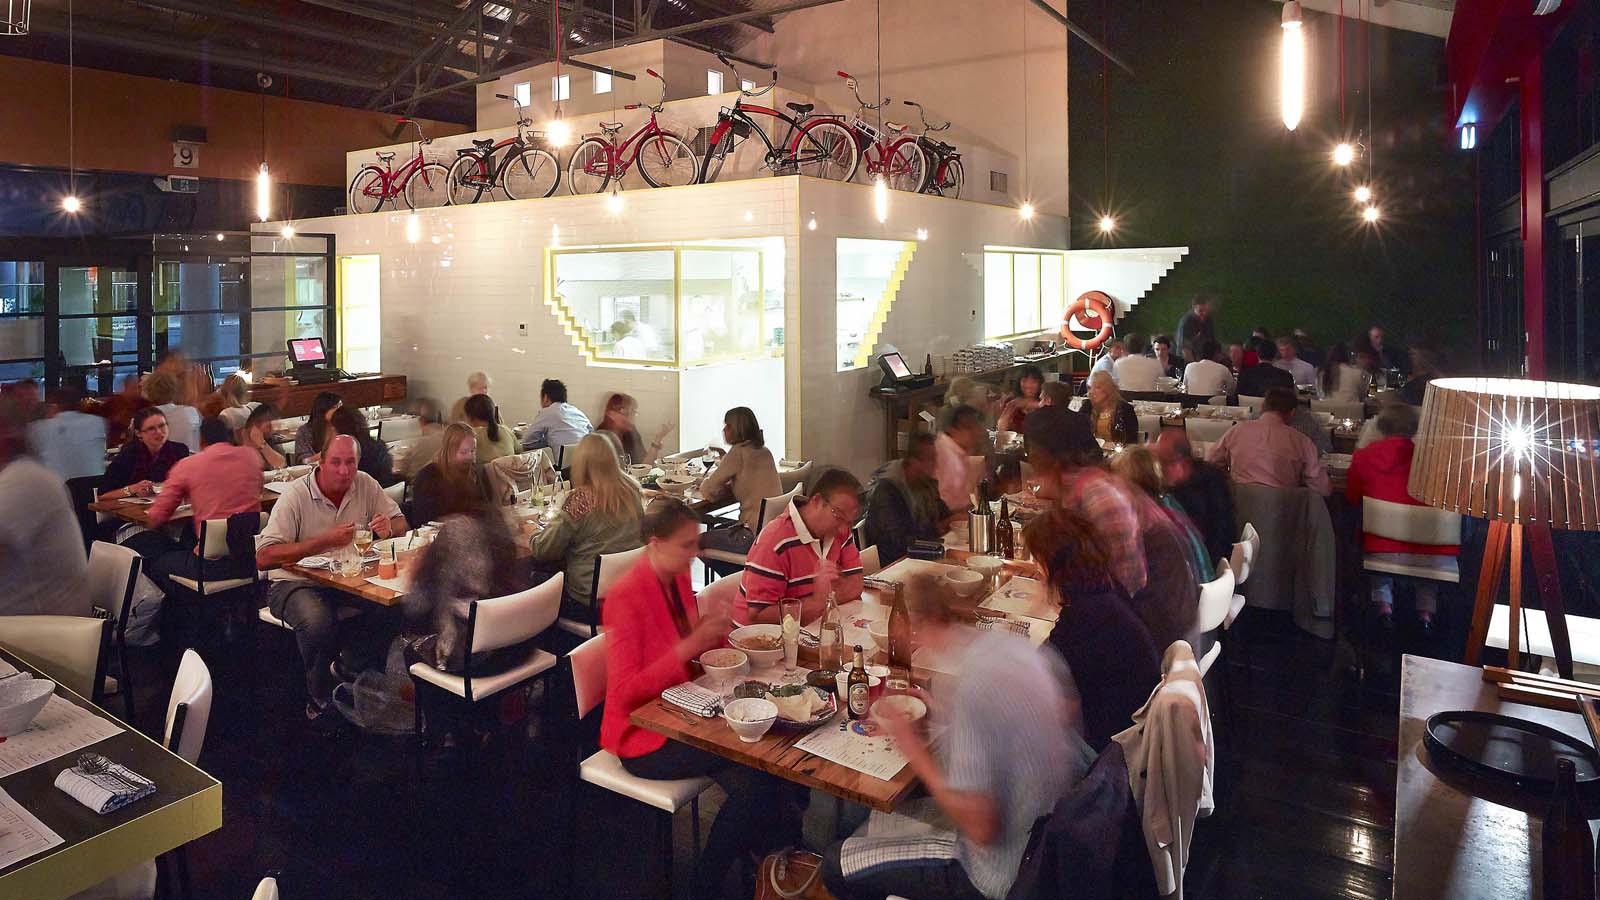 BangPop restaurant interior, Melbourne, Victoria, Australia